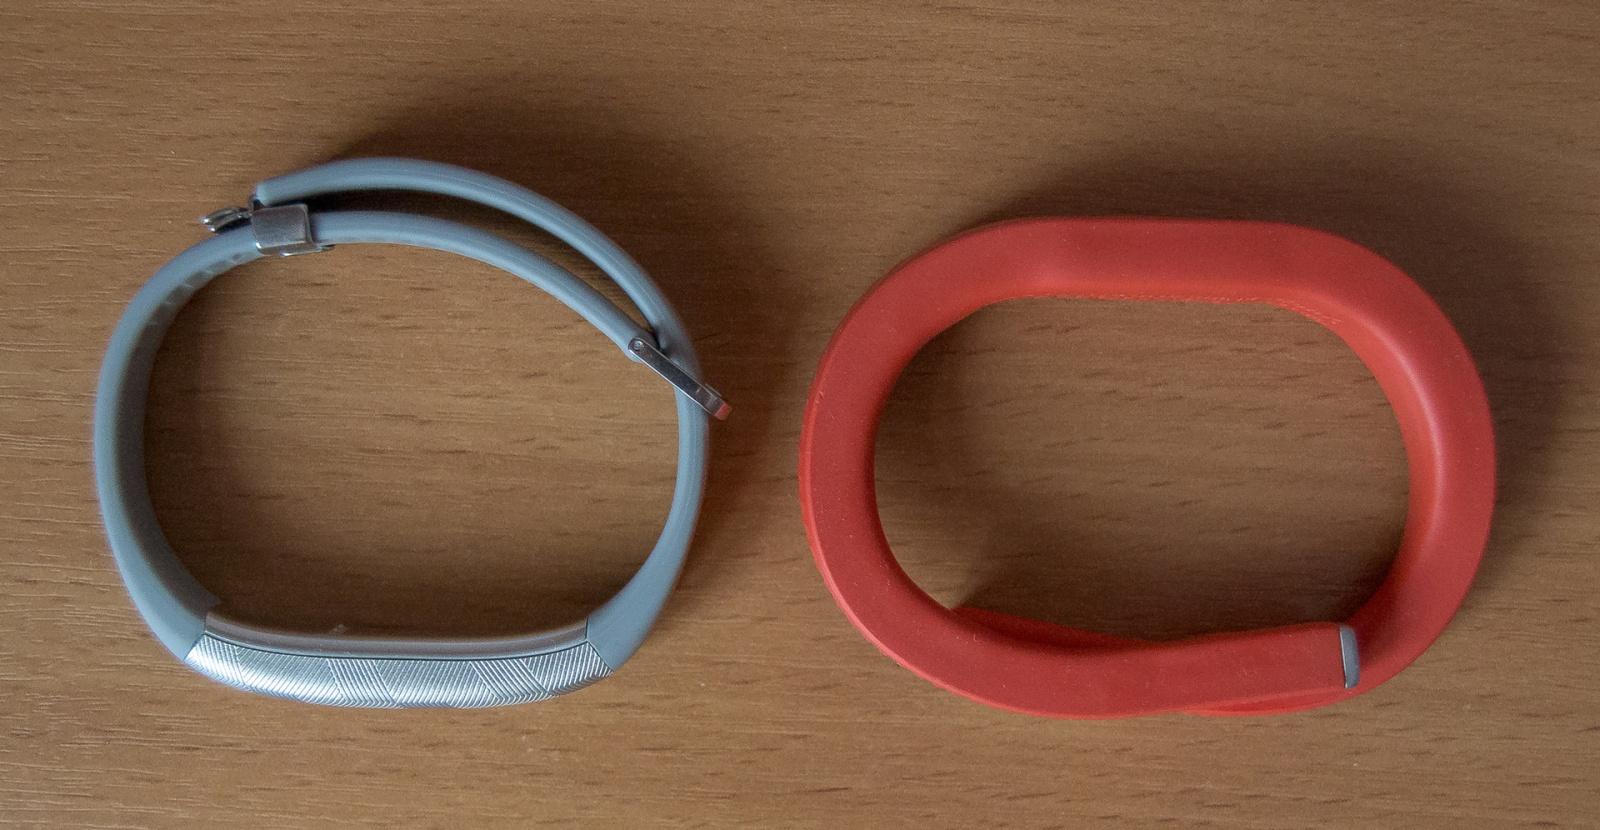 Спорт-семейство: Jawbone UP3 и UP2 с позабытым товарищем UP24 - 7